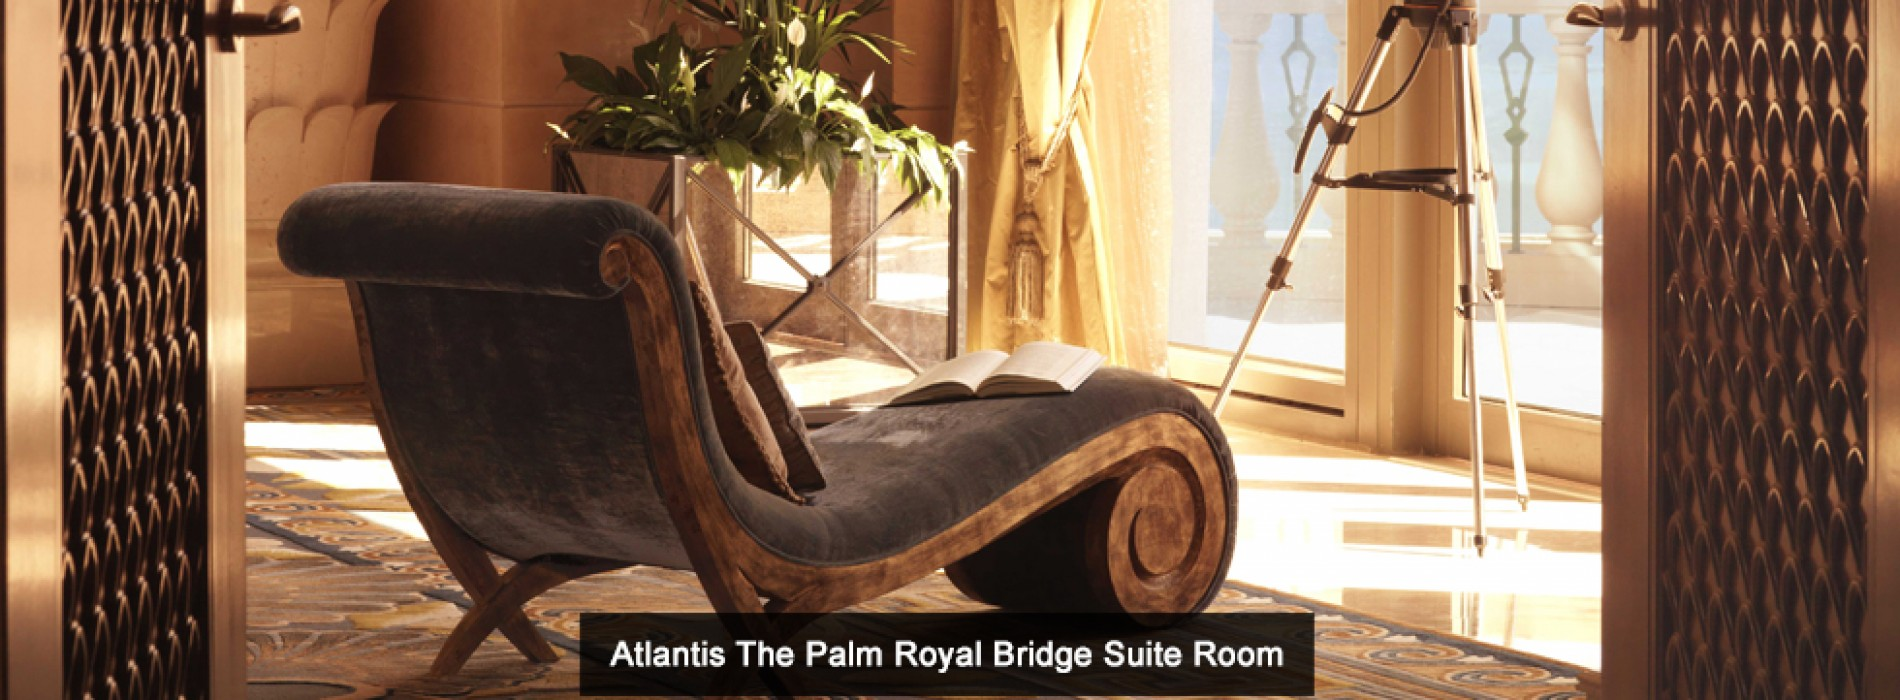 Atlantis, The Palm's guide to Luxury – inside the Royal Bridge Suite